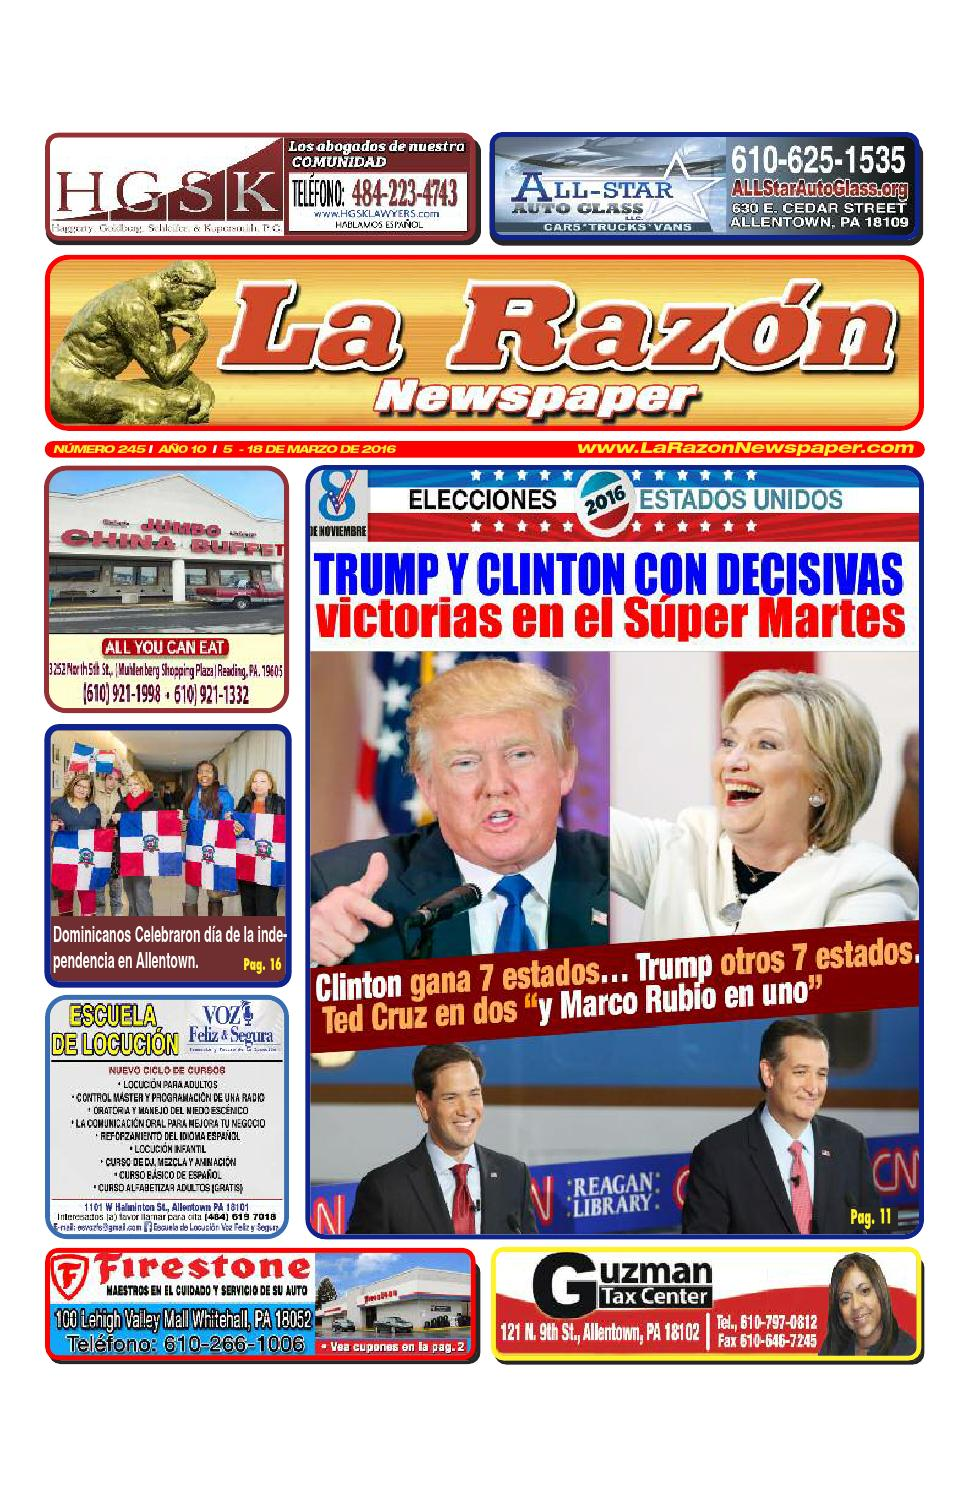 La Razón 245 32pages by La Razon Newspaper - issuu